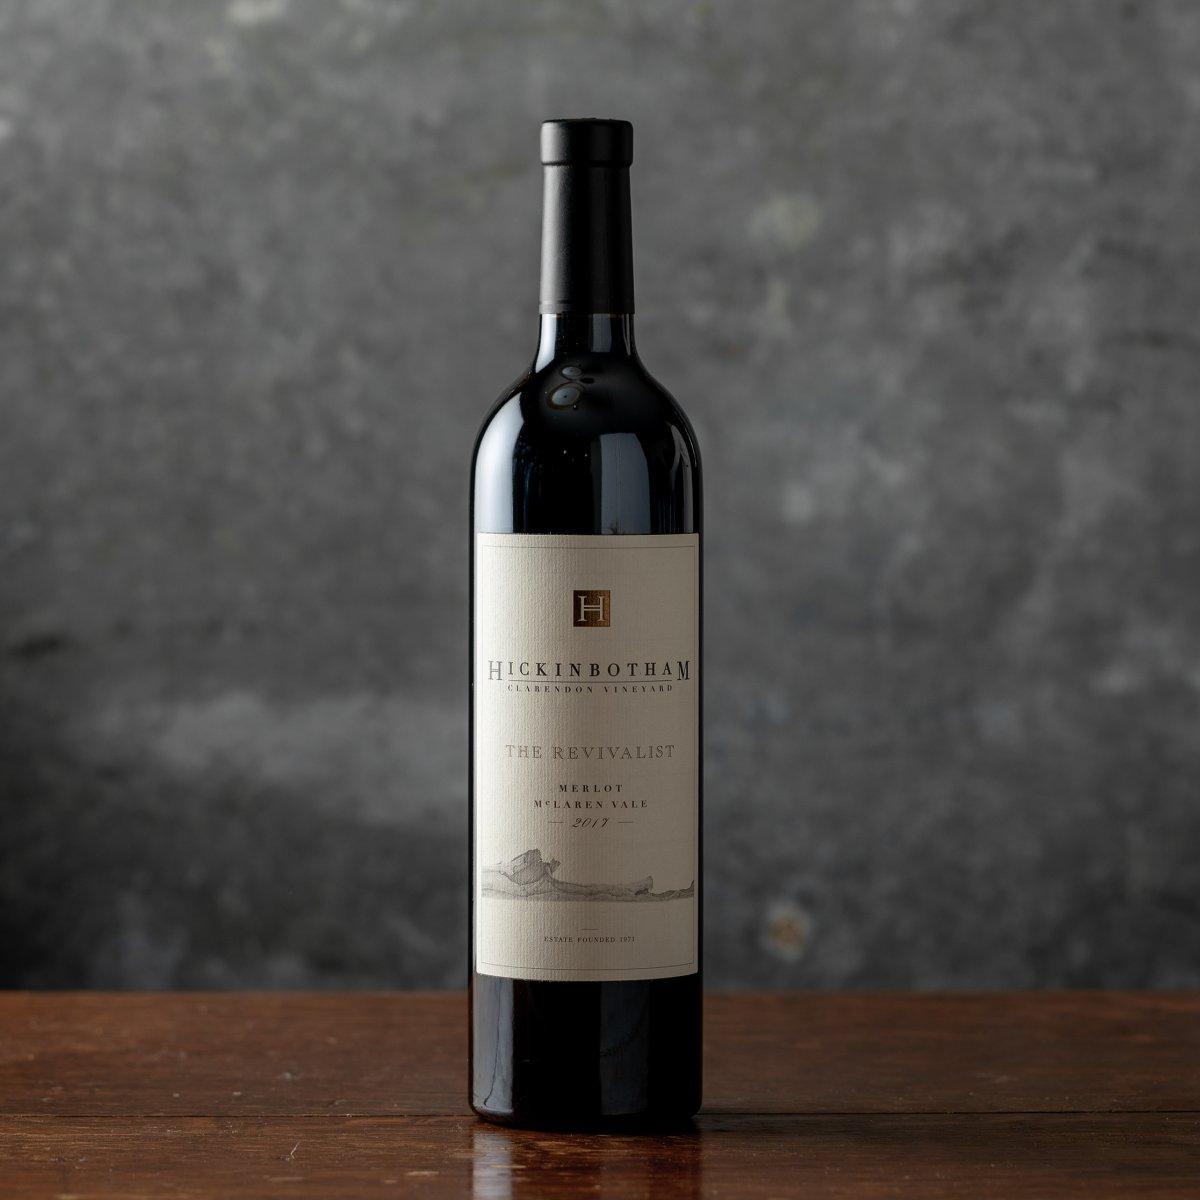 Wine bottle of The Revivialist Merlot against a gray backdrop